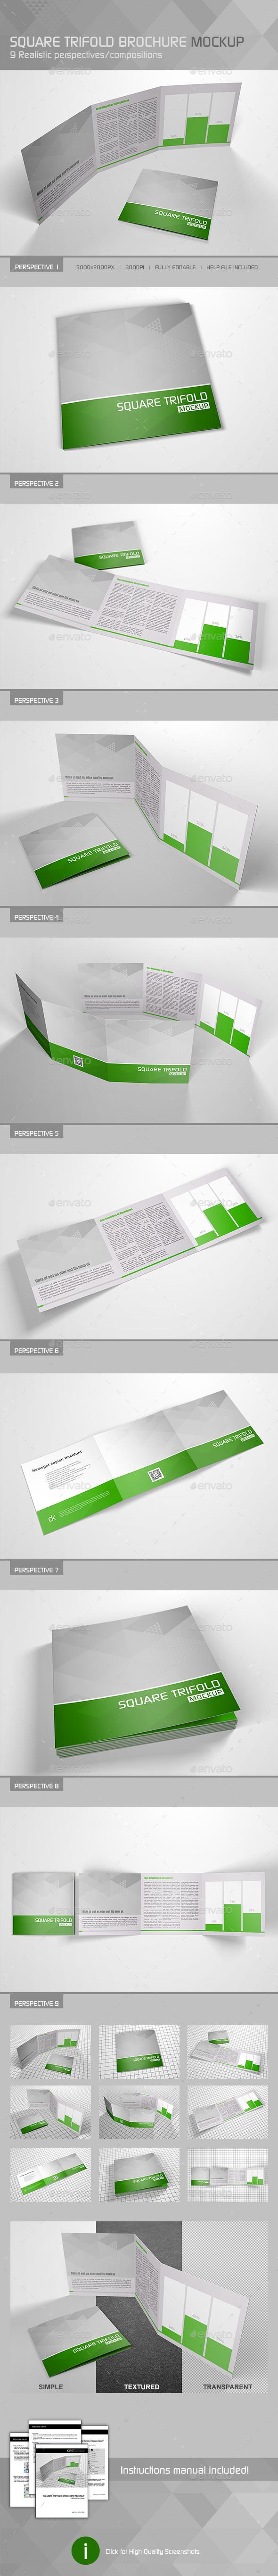 Realistic Square Trifold Brochure Mockup - Brochures Print